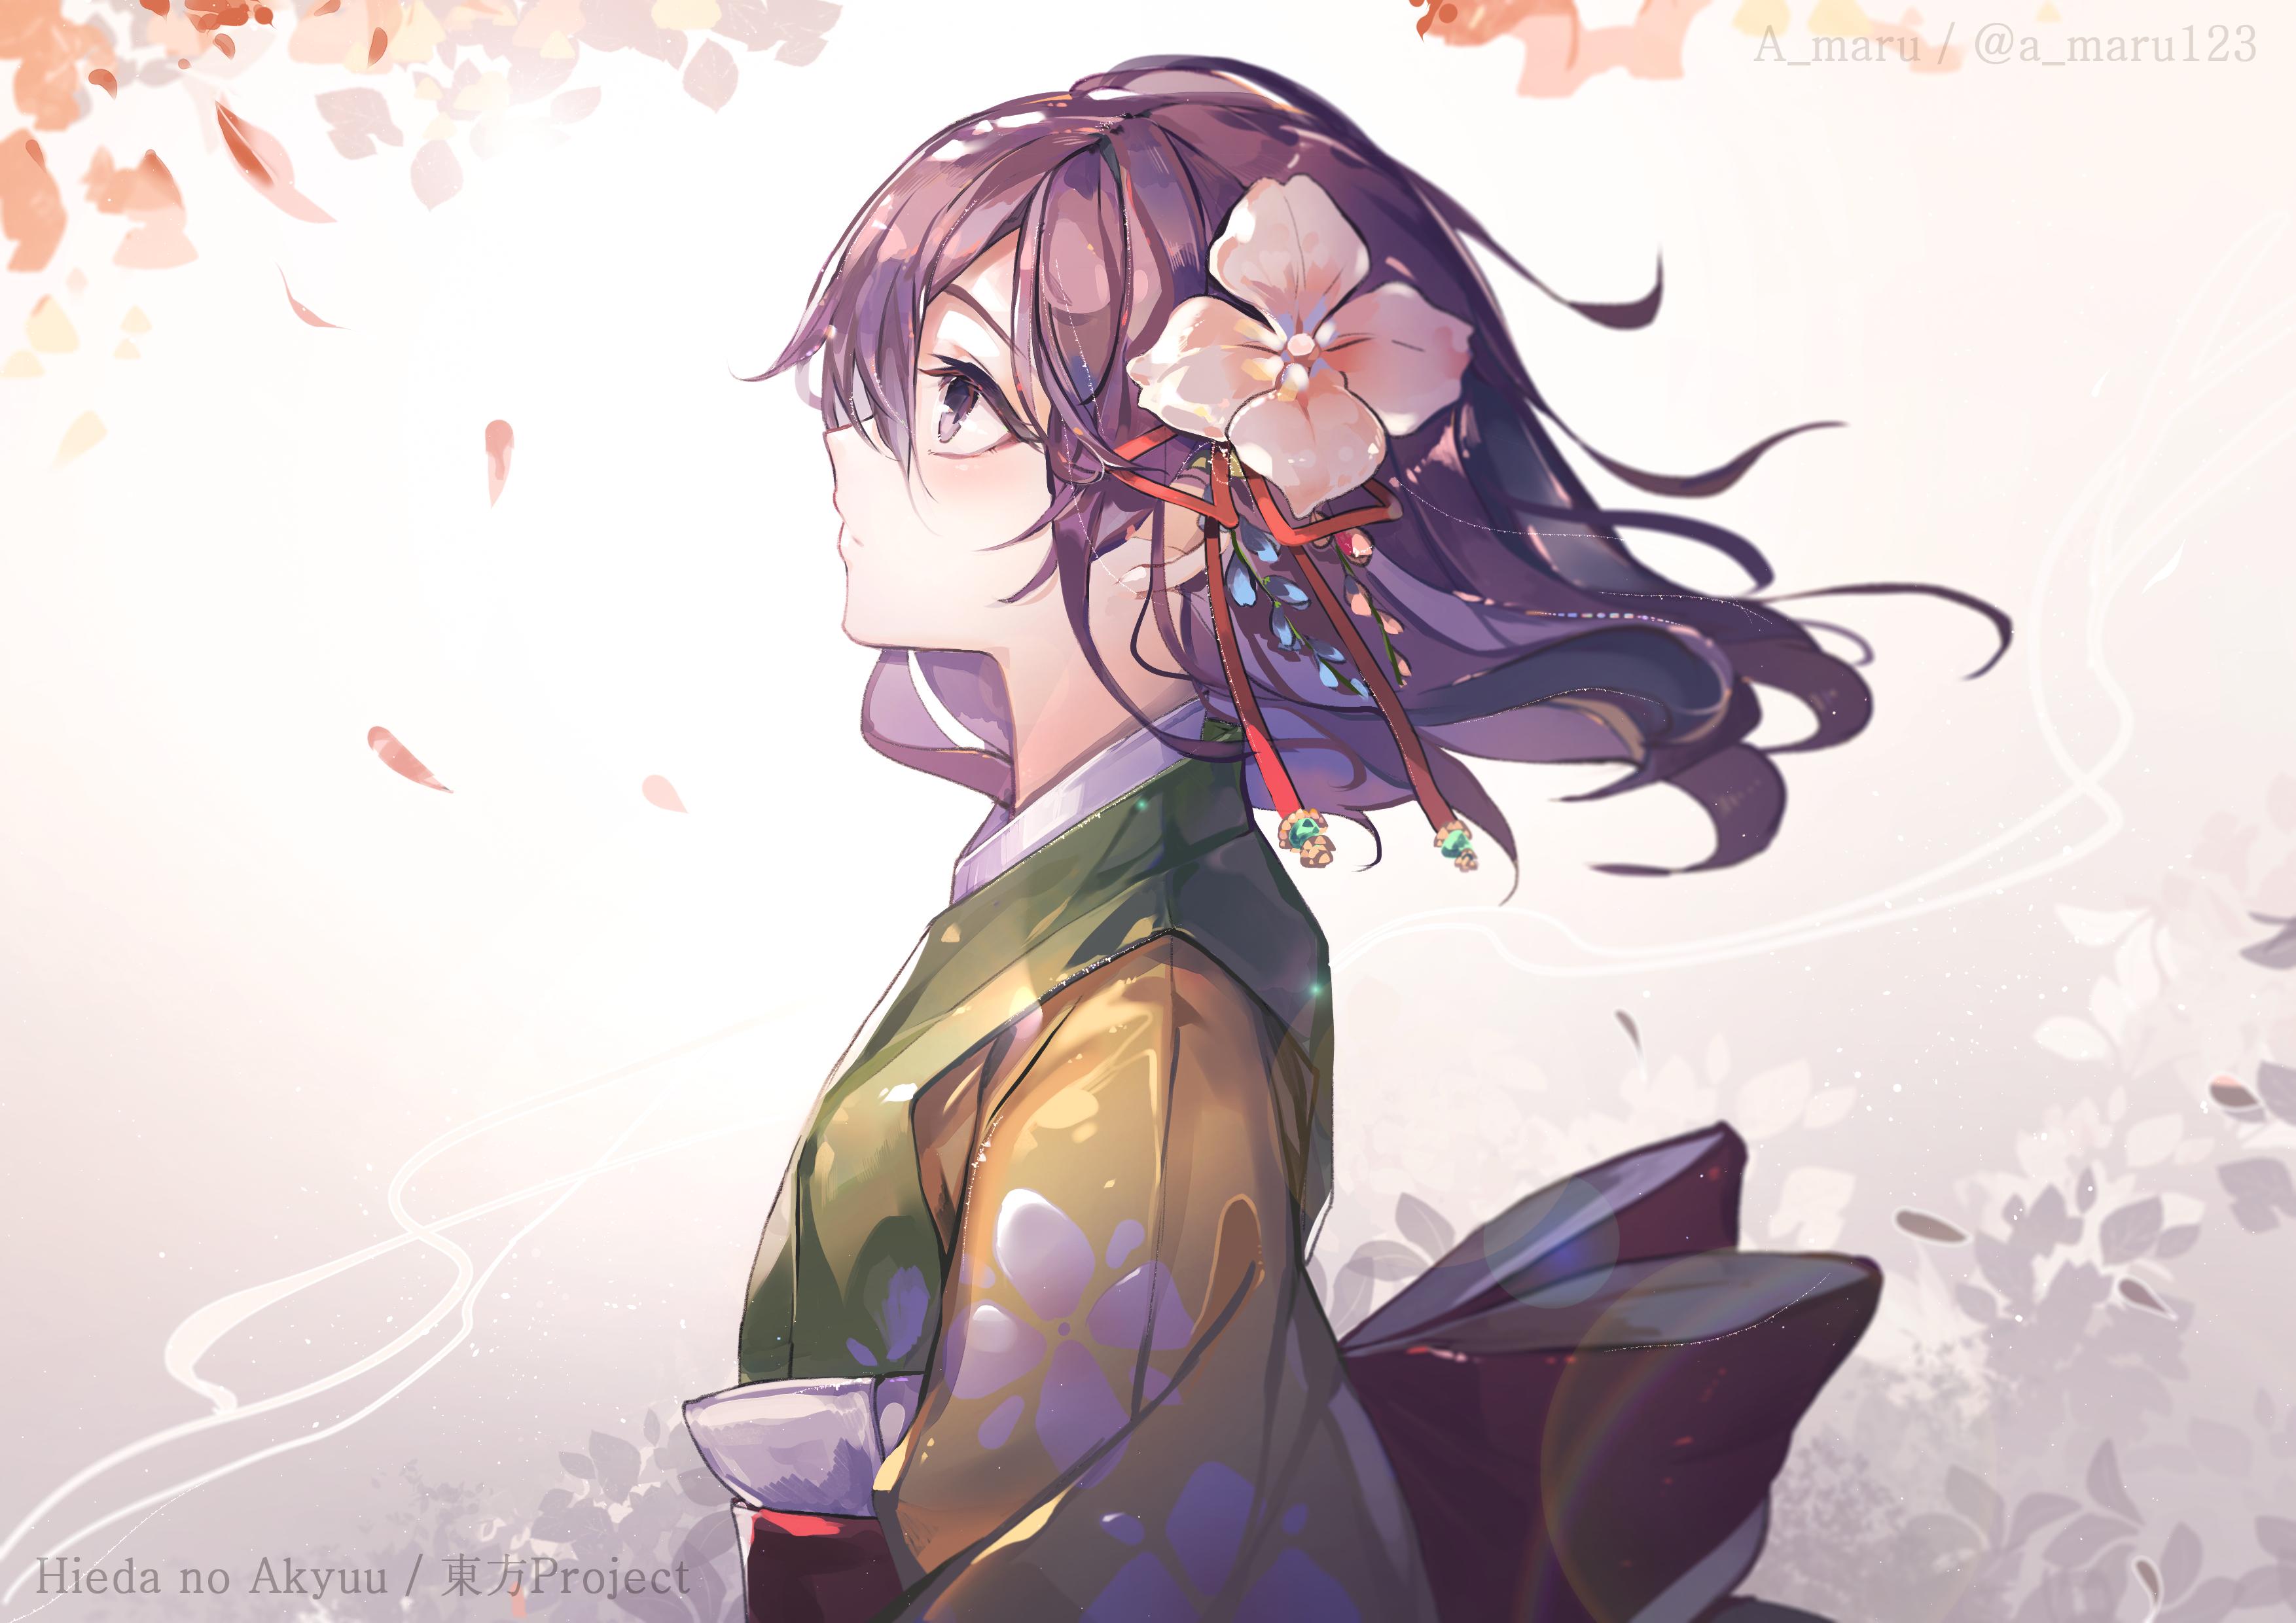 Anime 3508x2480 Touhou Hieda no Akyuu Japanese kimono flower bow purple hair purple eyes cherry blossom short hair anime girls